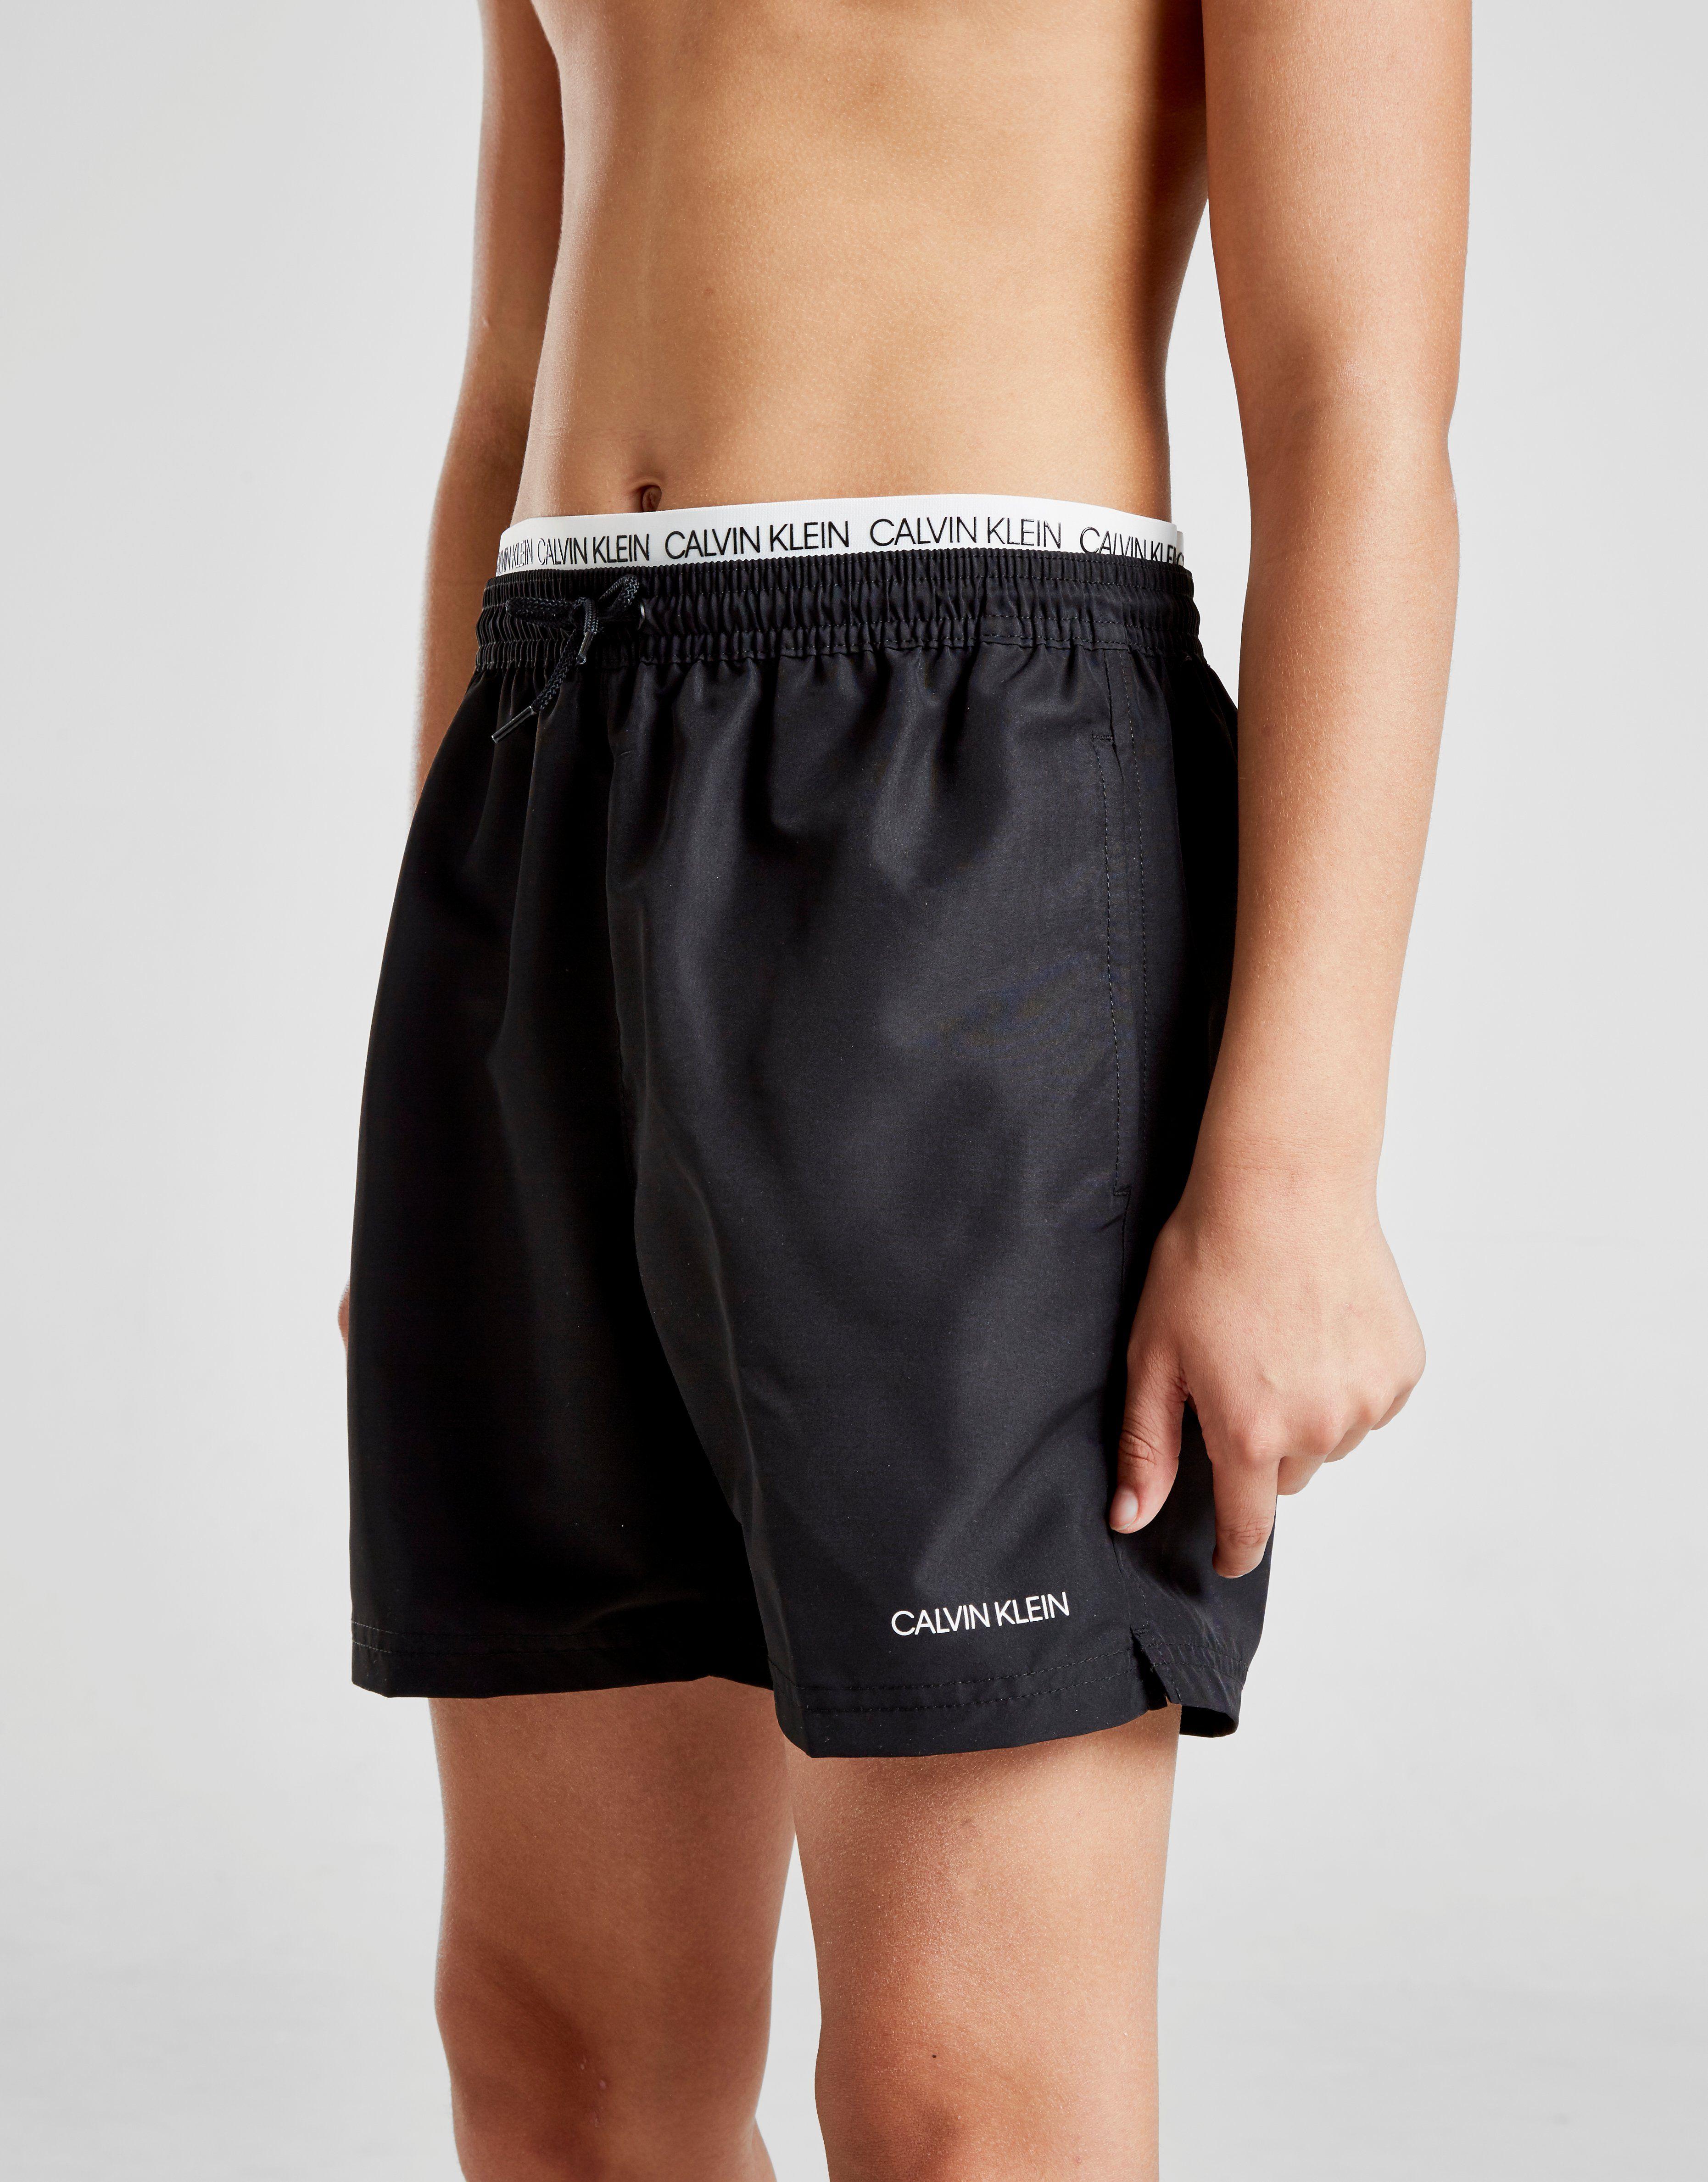 huge discount dfcf2 ebf2d Calvin Klein Waistband Swim Shorts Junior   JD Sports Ireland